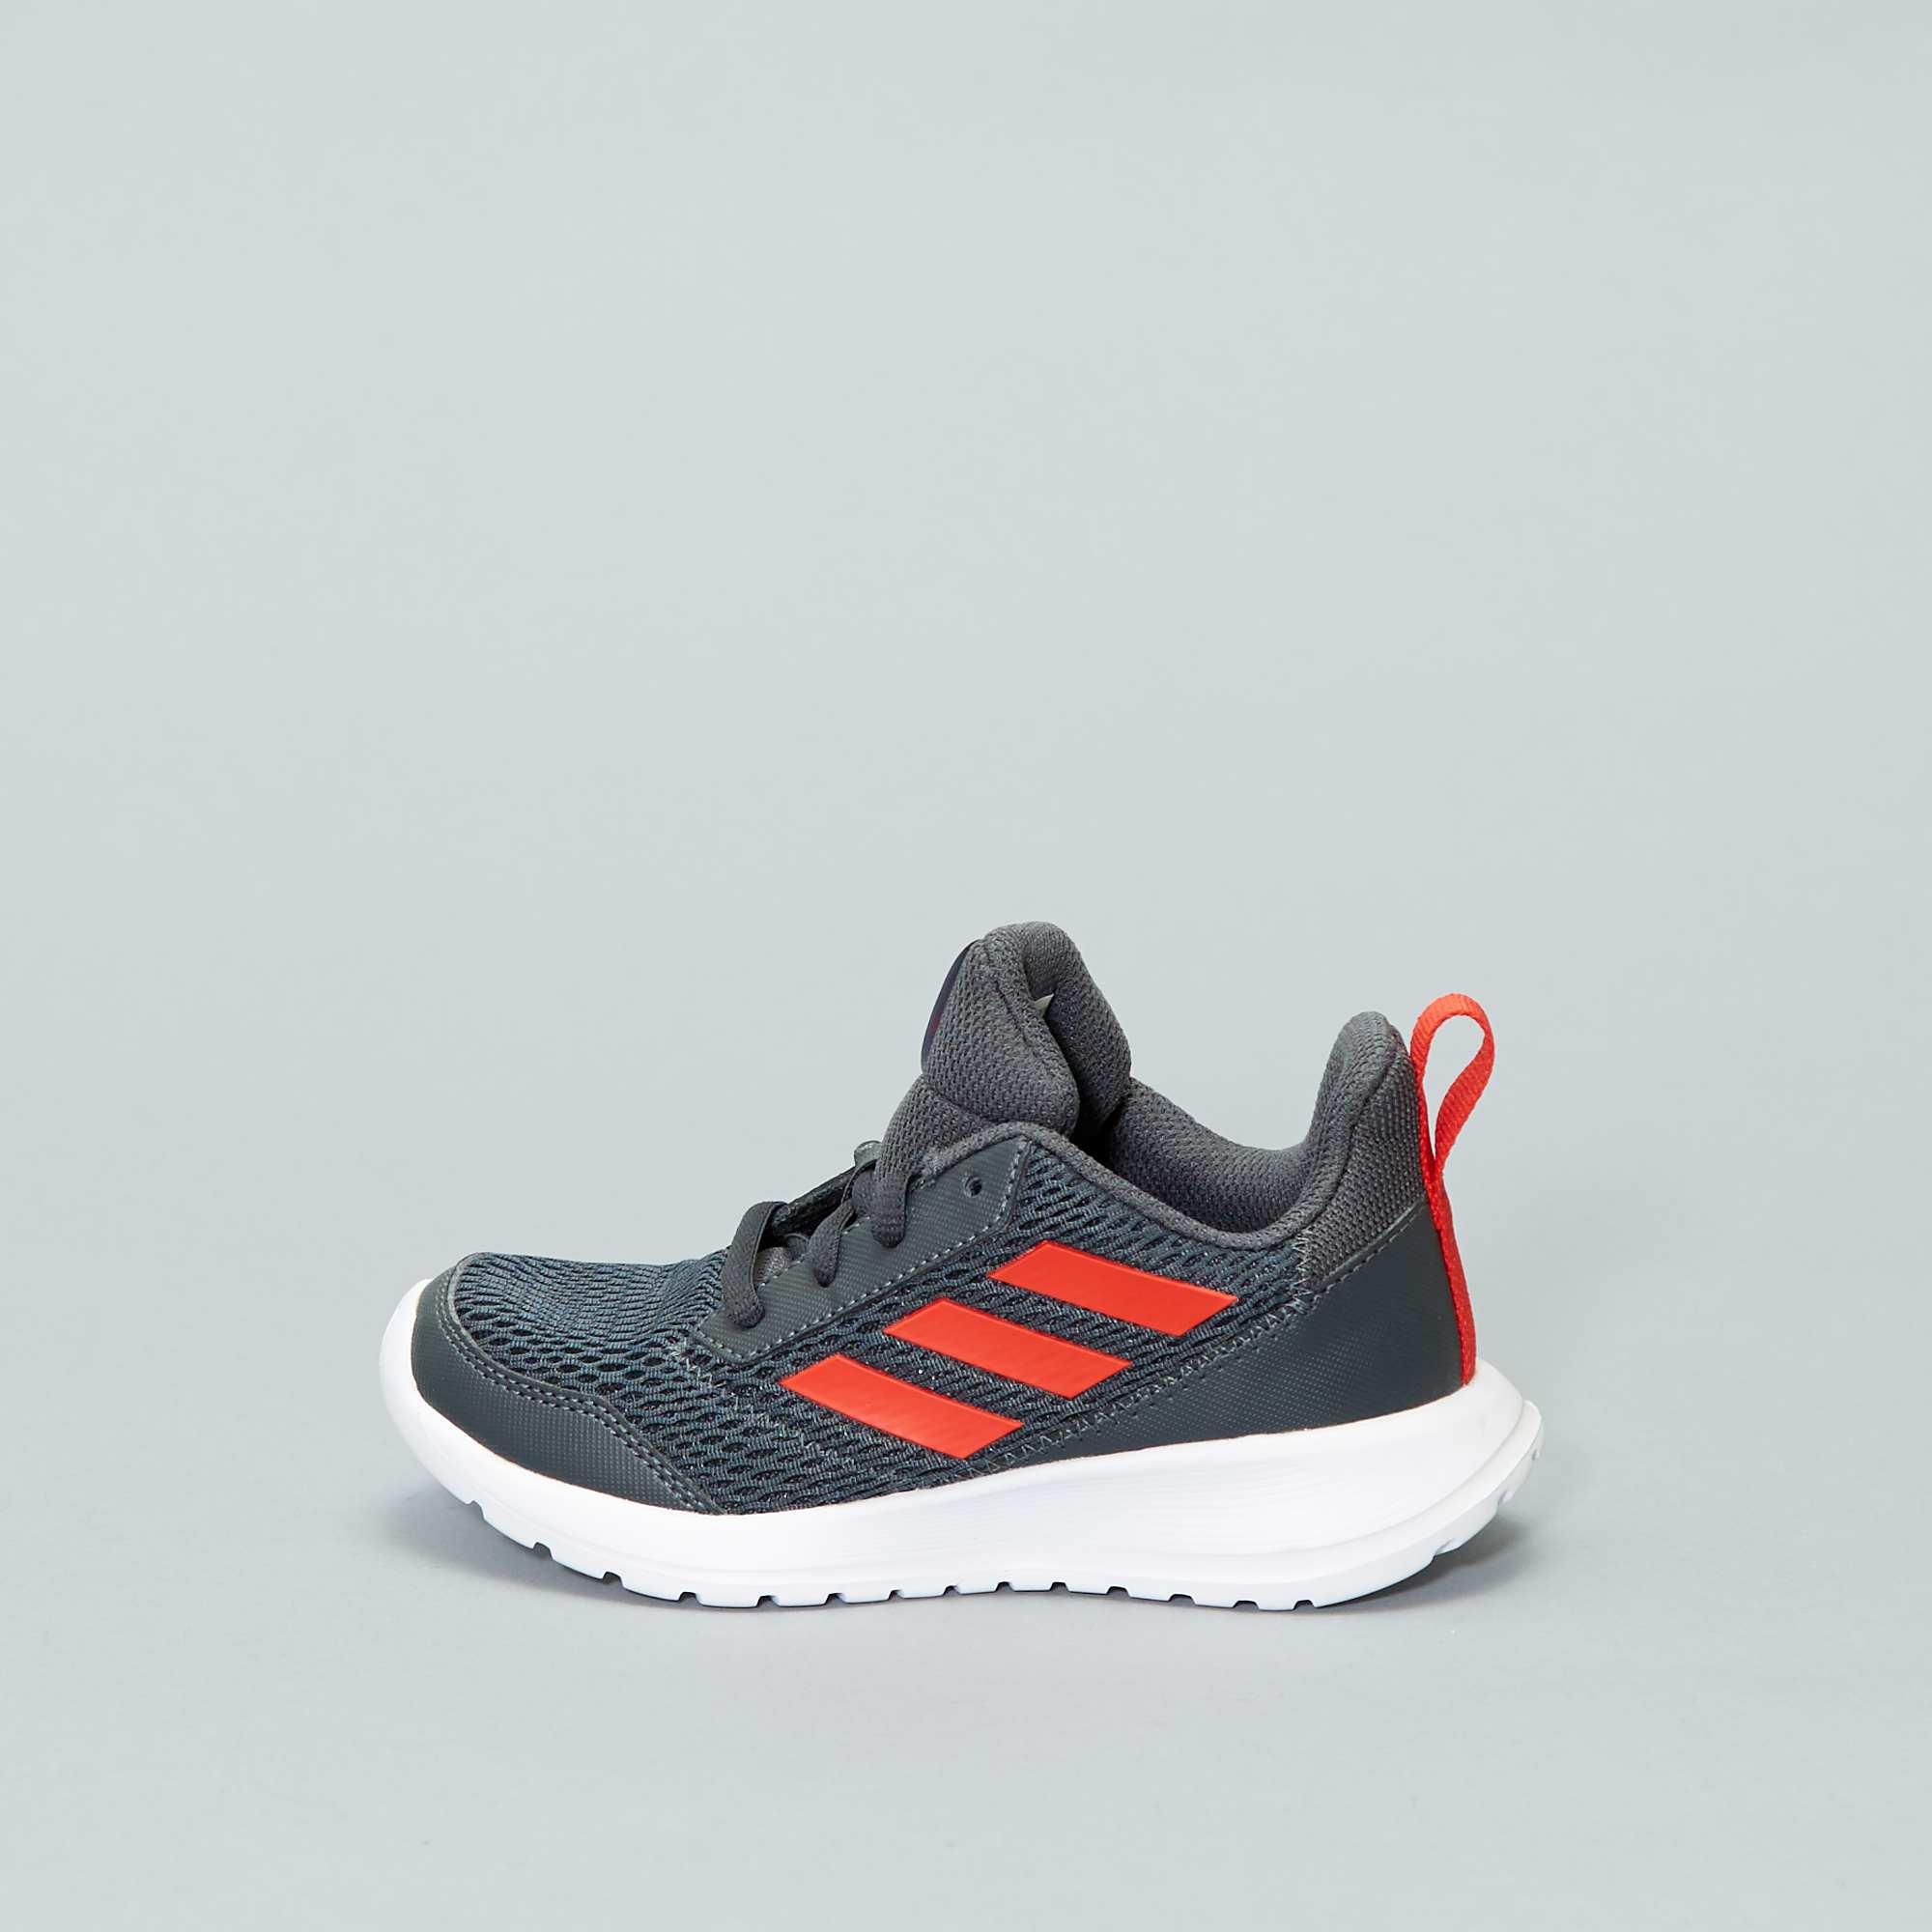 0ec11ddb44072 Zapatillas deportivas técnicas  Adidas  Chico - KAKI - Kiabi - 35